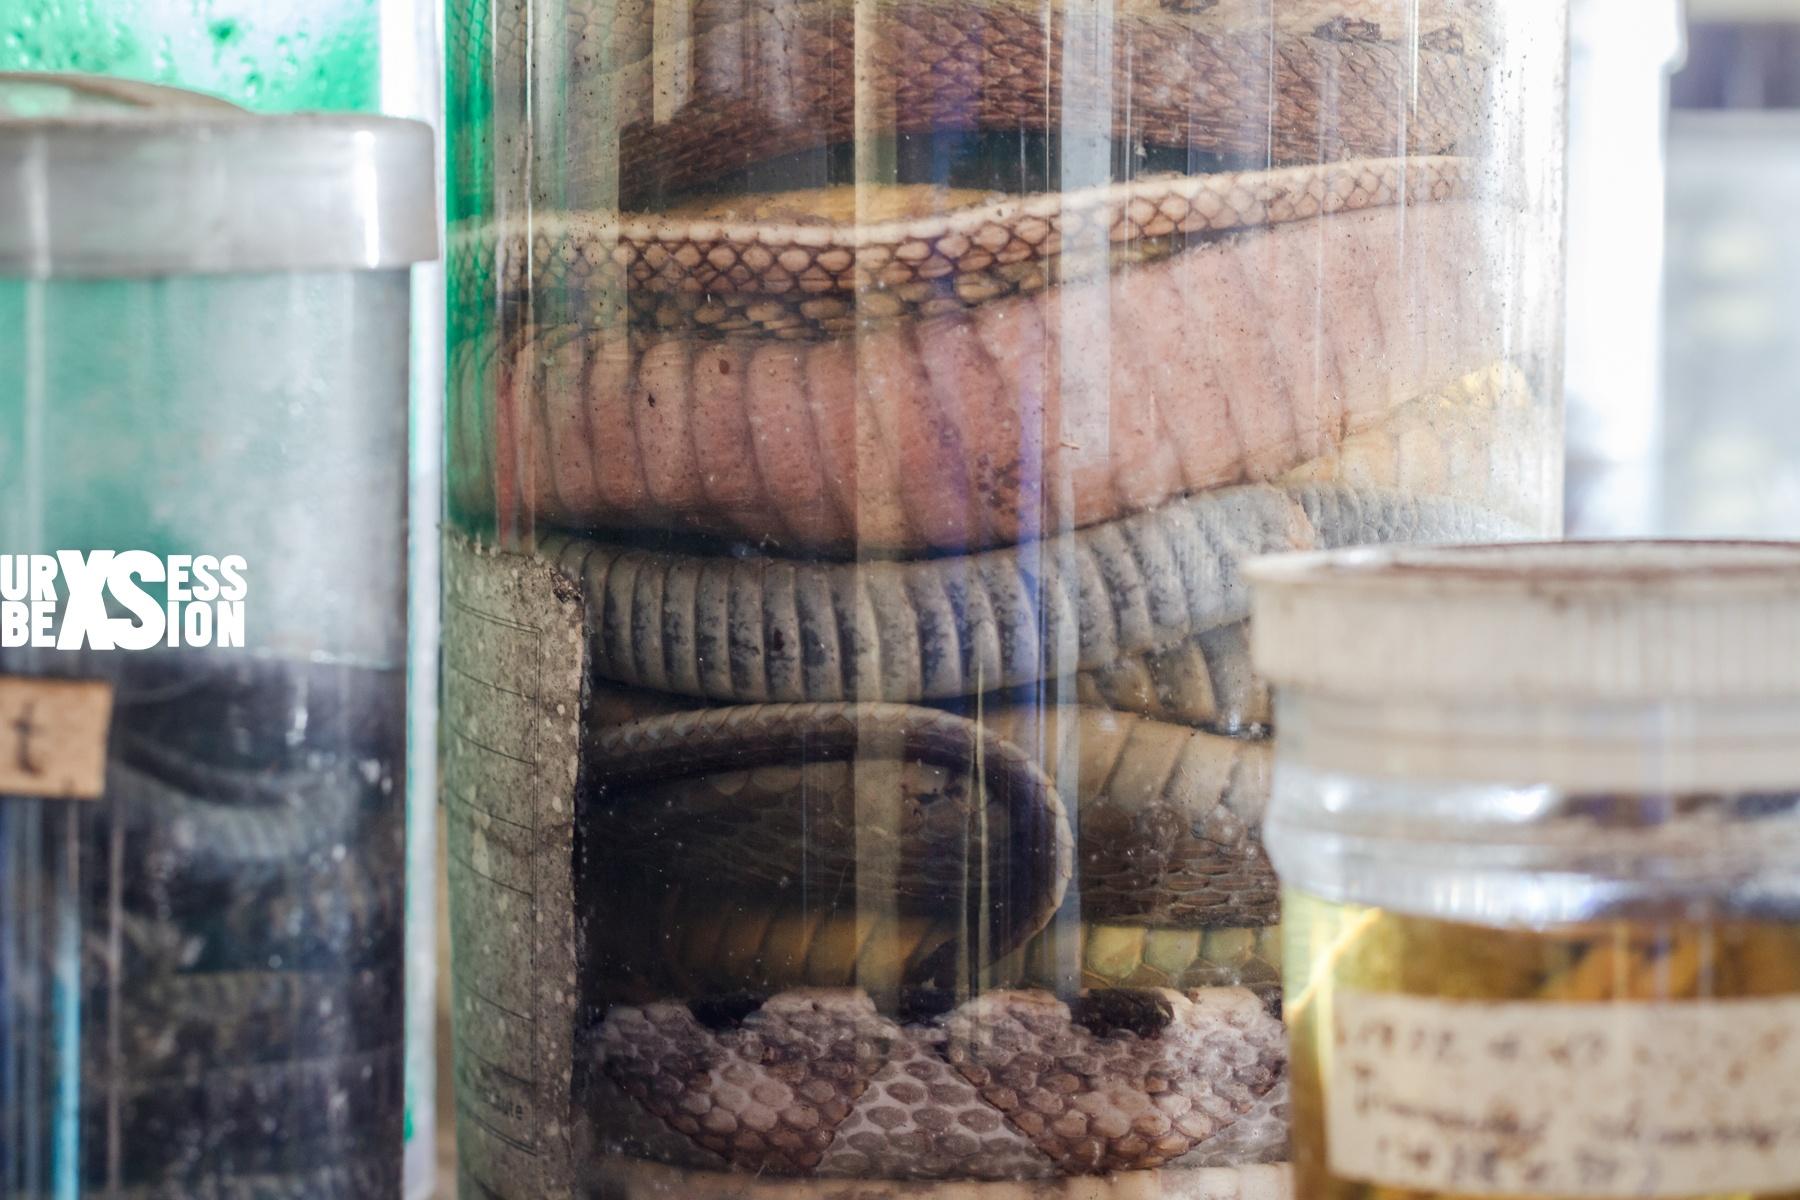 laboratoire-serpents-9